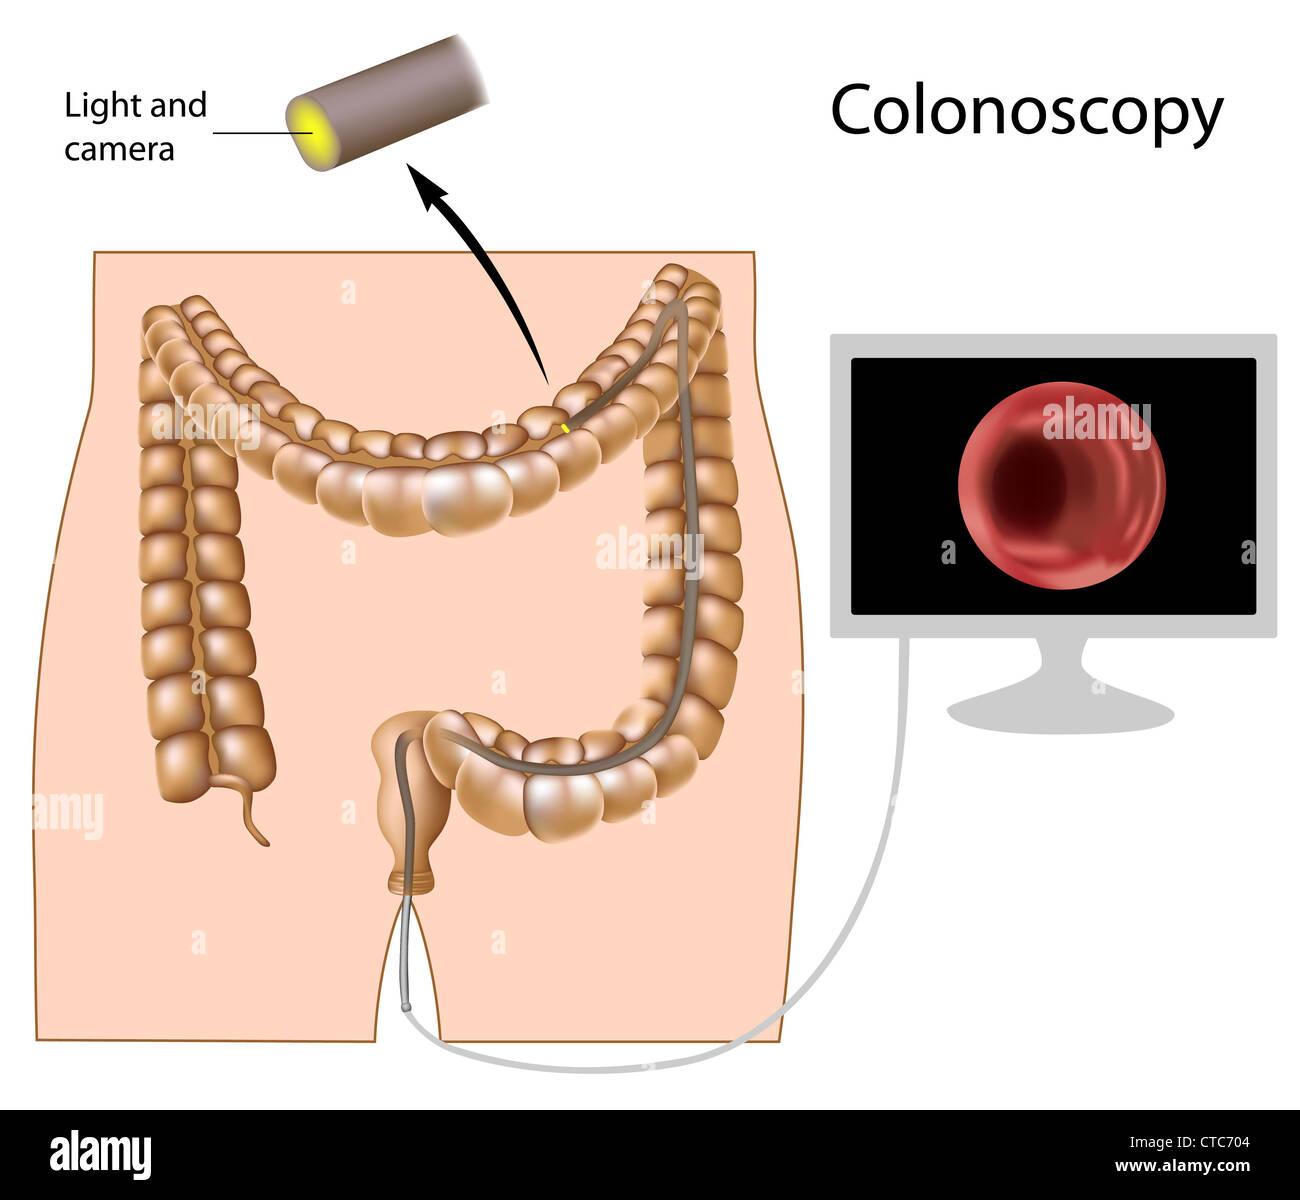 colonoscopy prep instructions pico salax